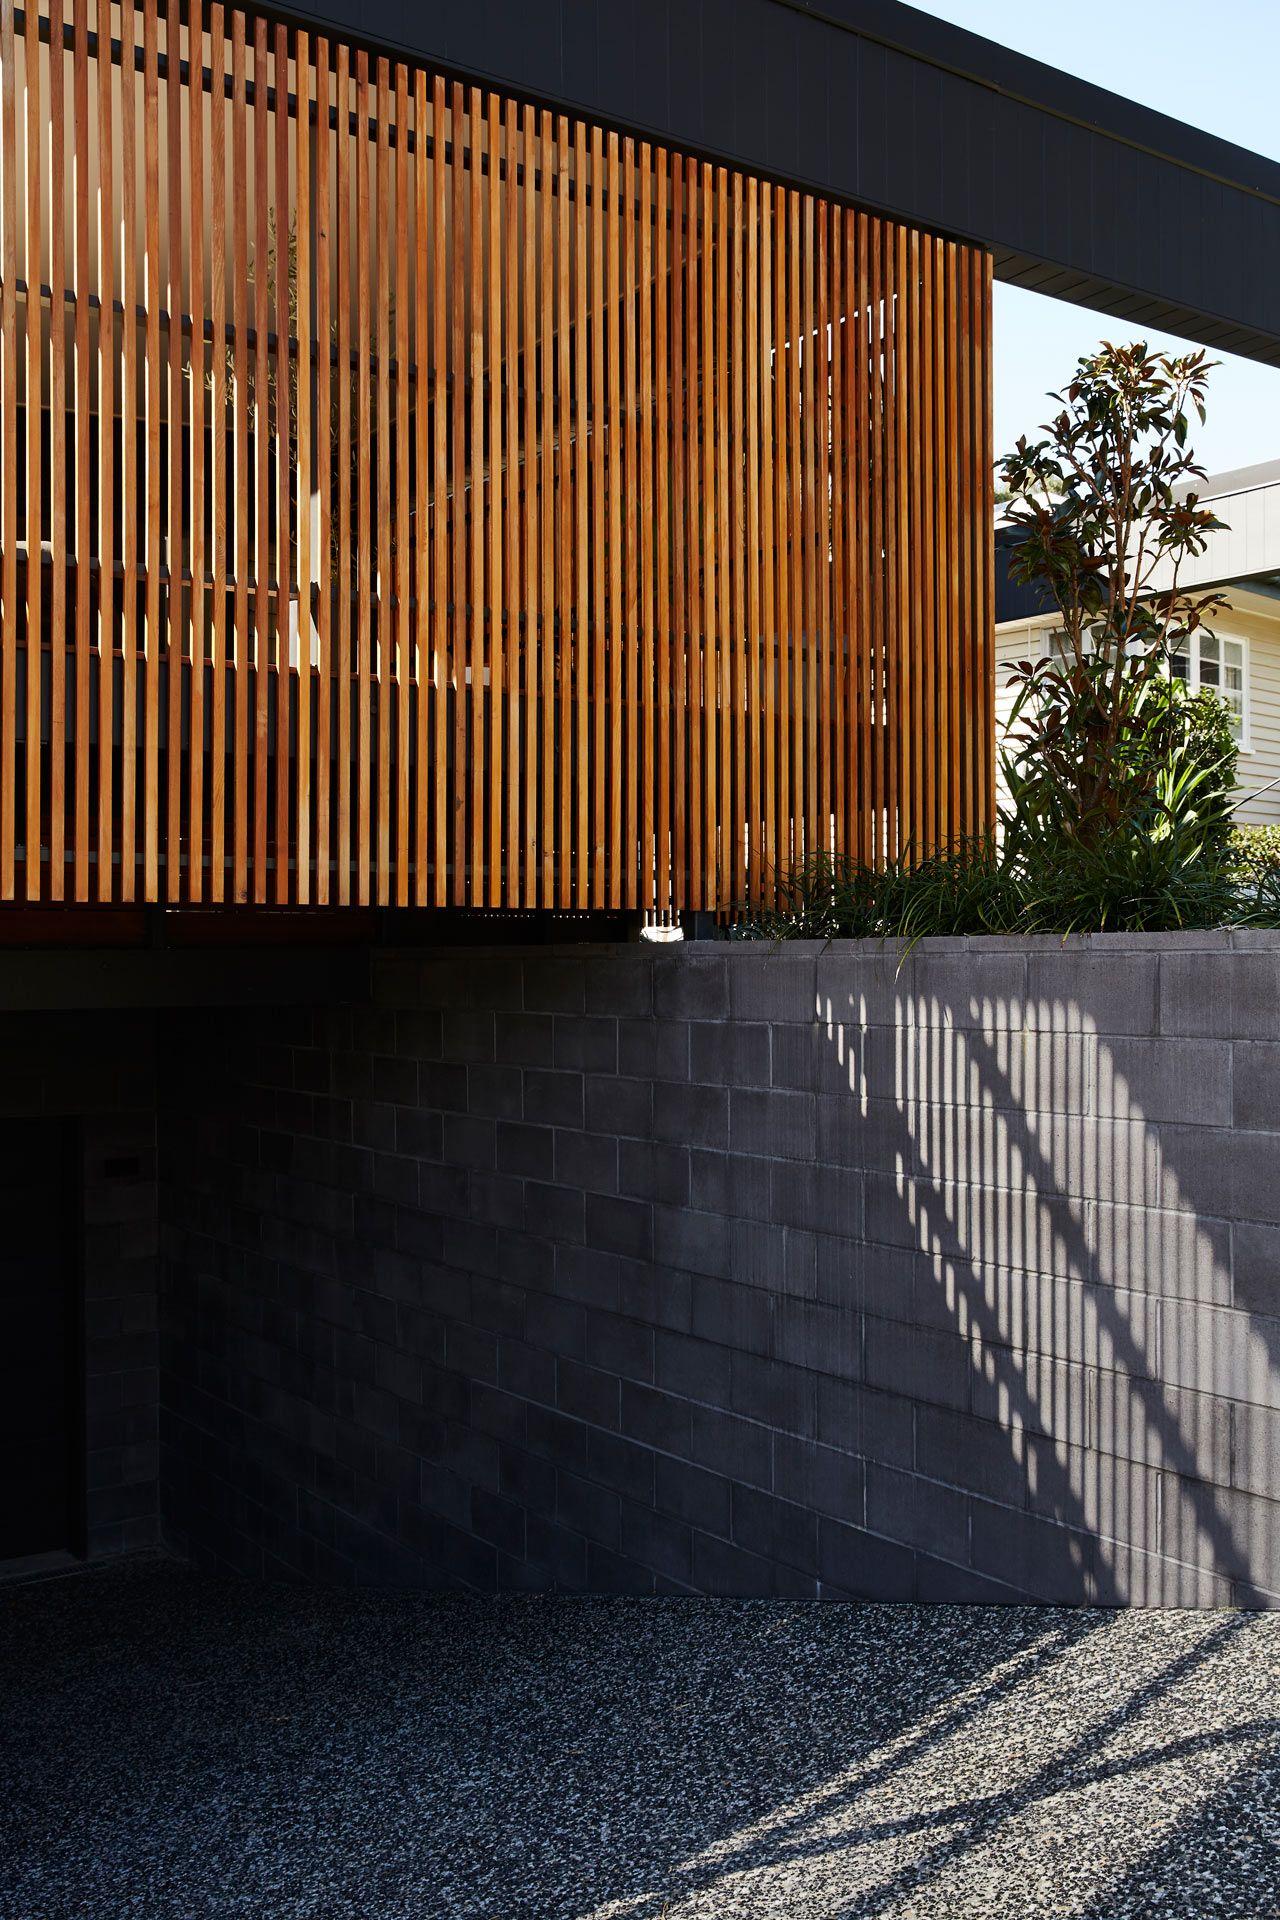 4, Build Garagecarport, Fence Of Top As